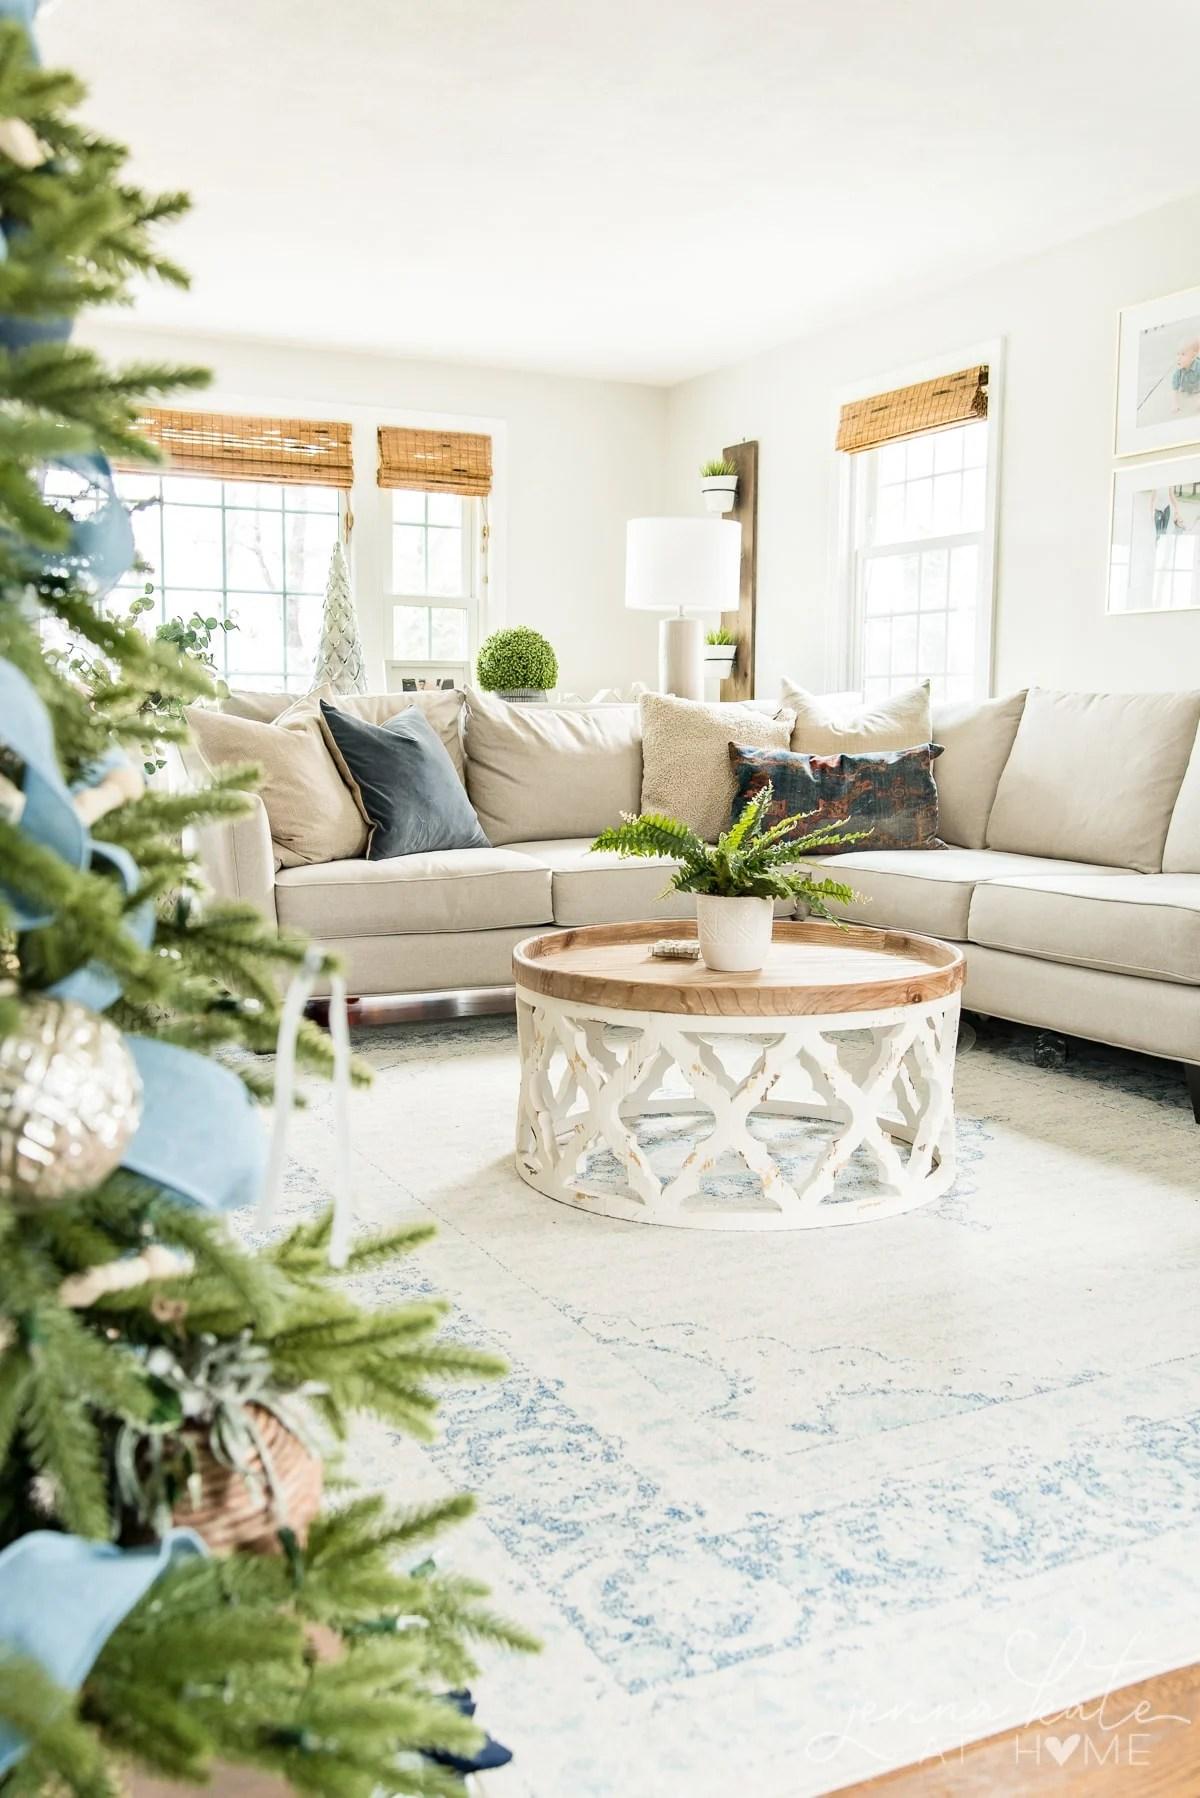 View of the living room peeking through the Christmas tree